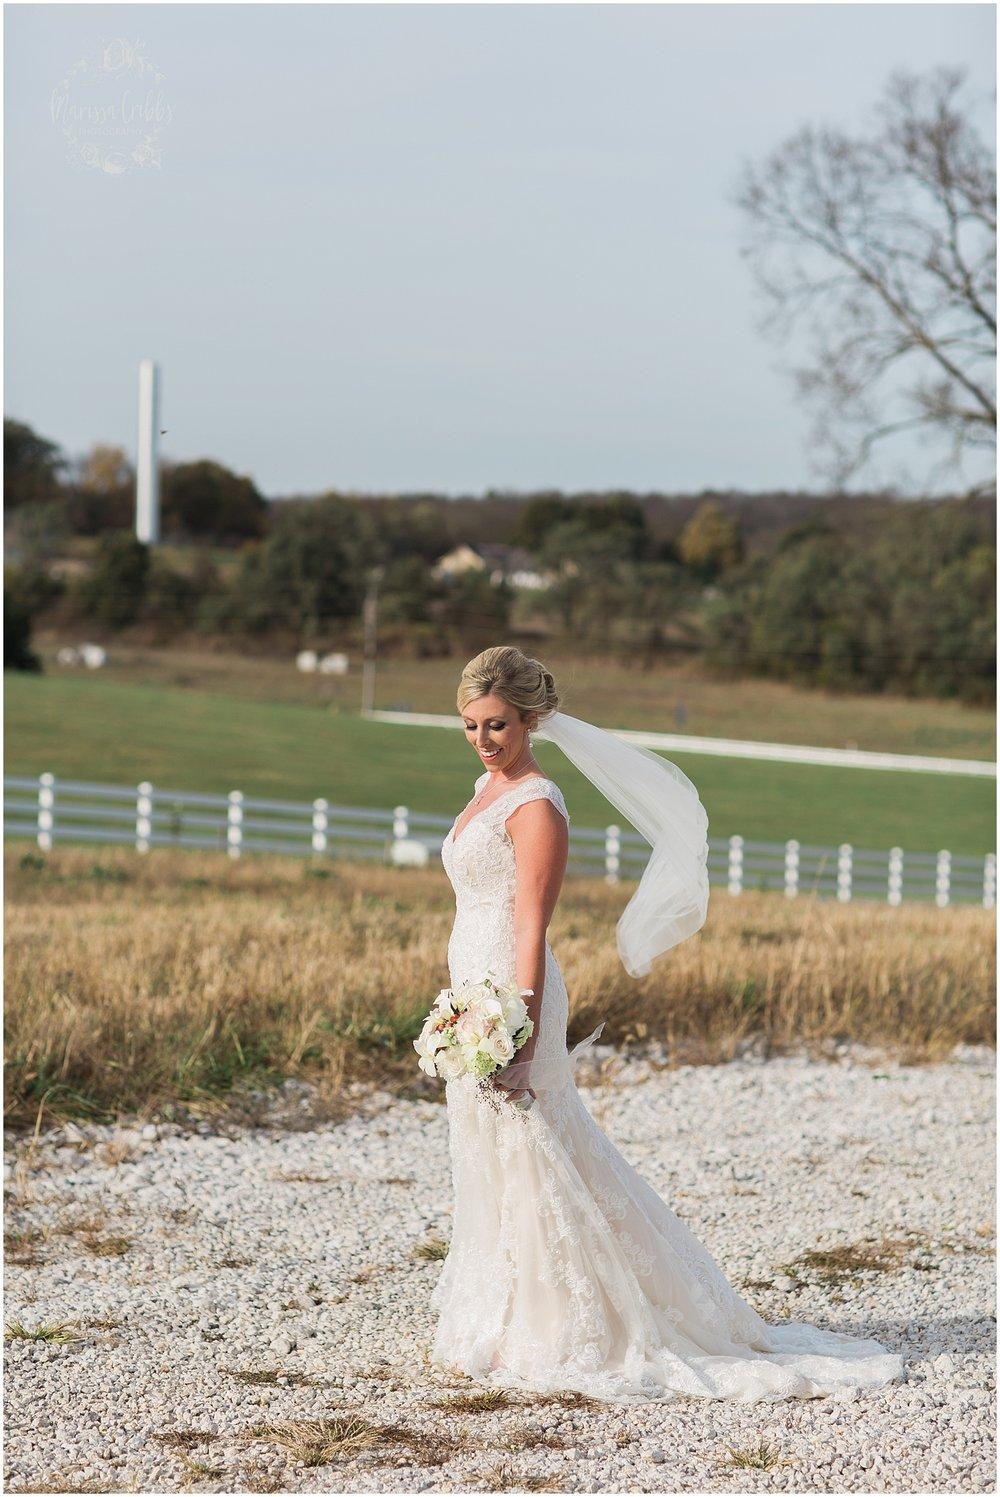 Alex & Amie | Eighteen Ninety Event Space | Marissa Cribbs Photography | Kansas City Perfect Wedding Guide_1285.jpg